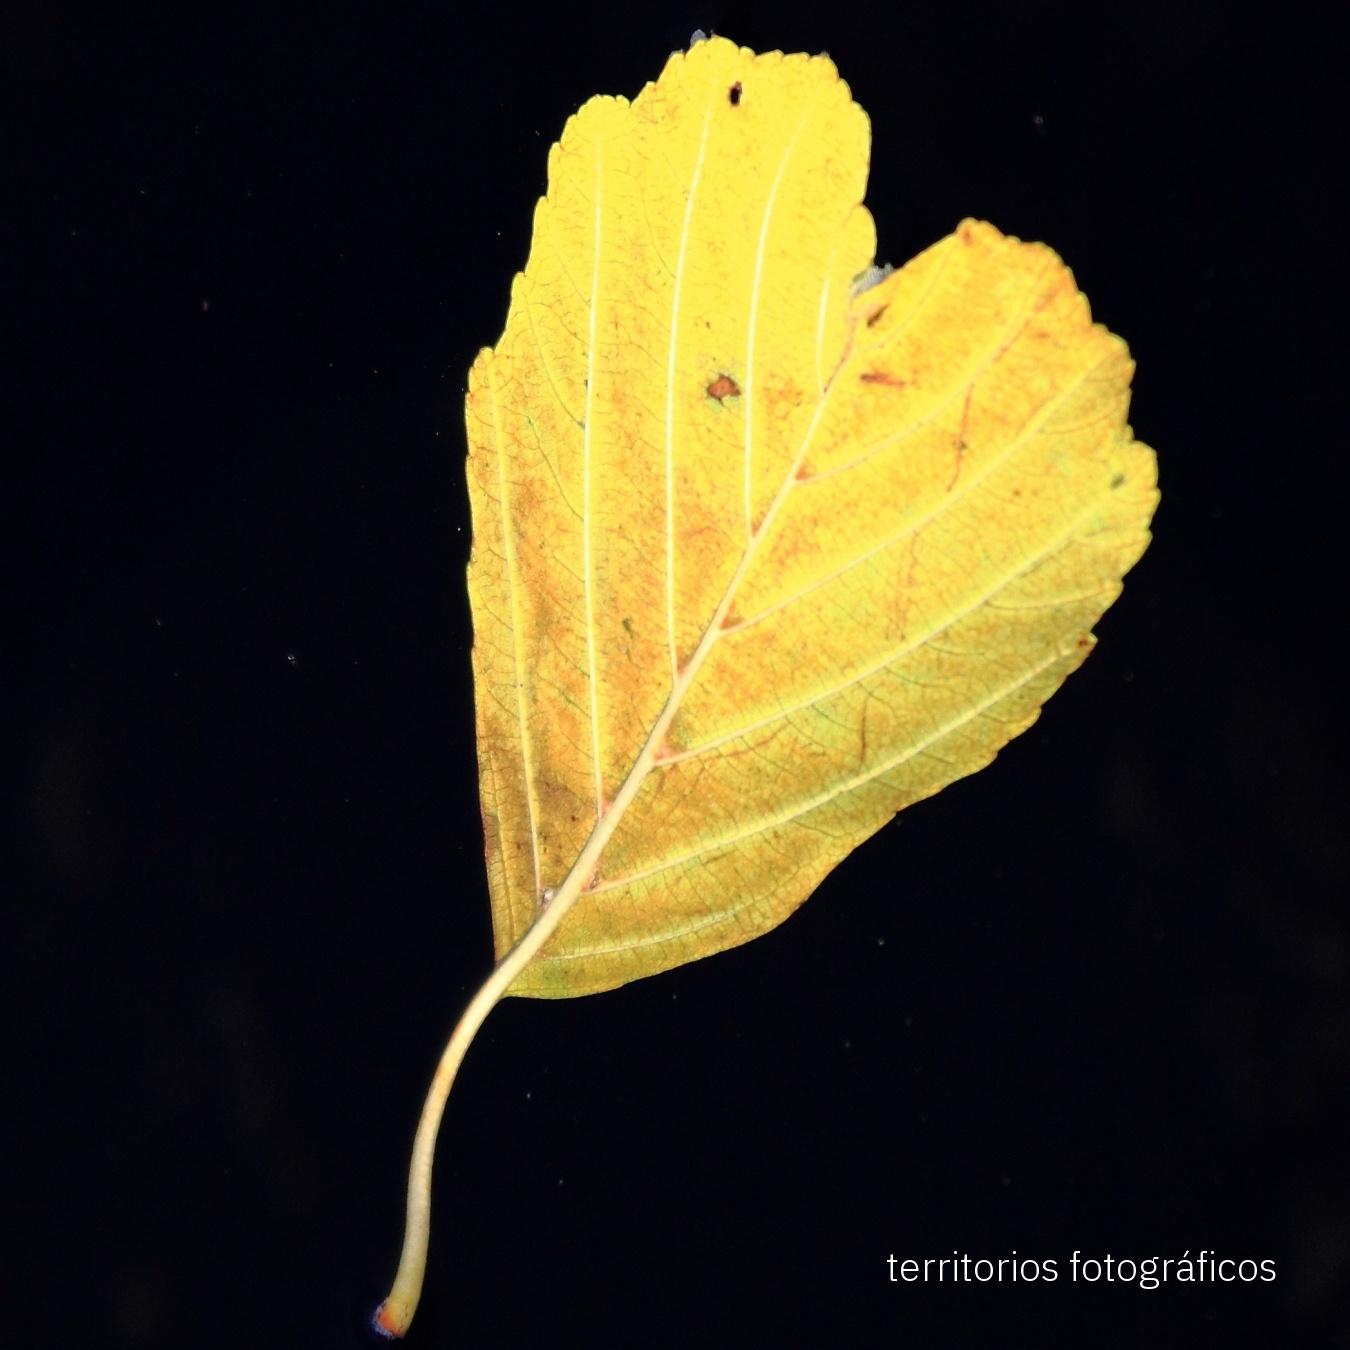 natural design - territorios fotográficos